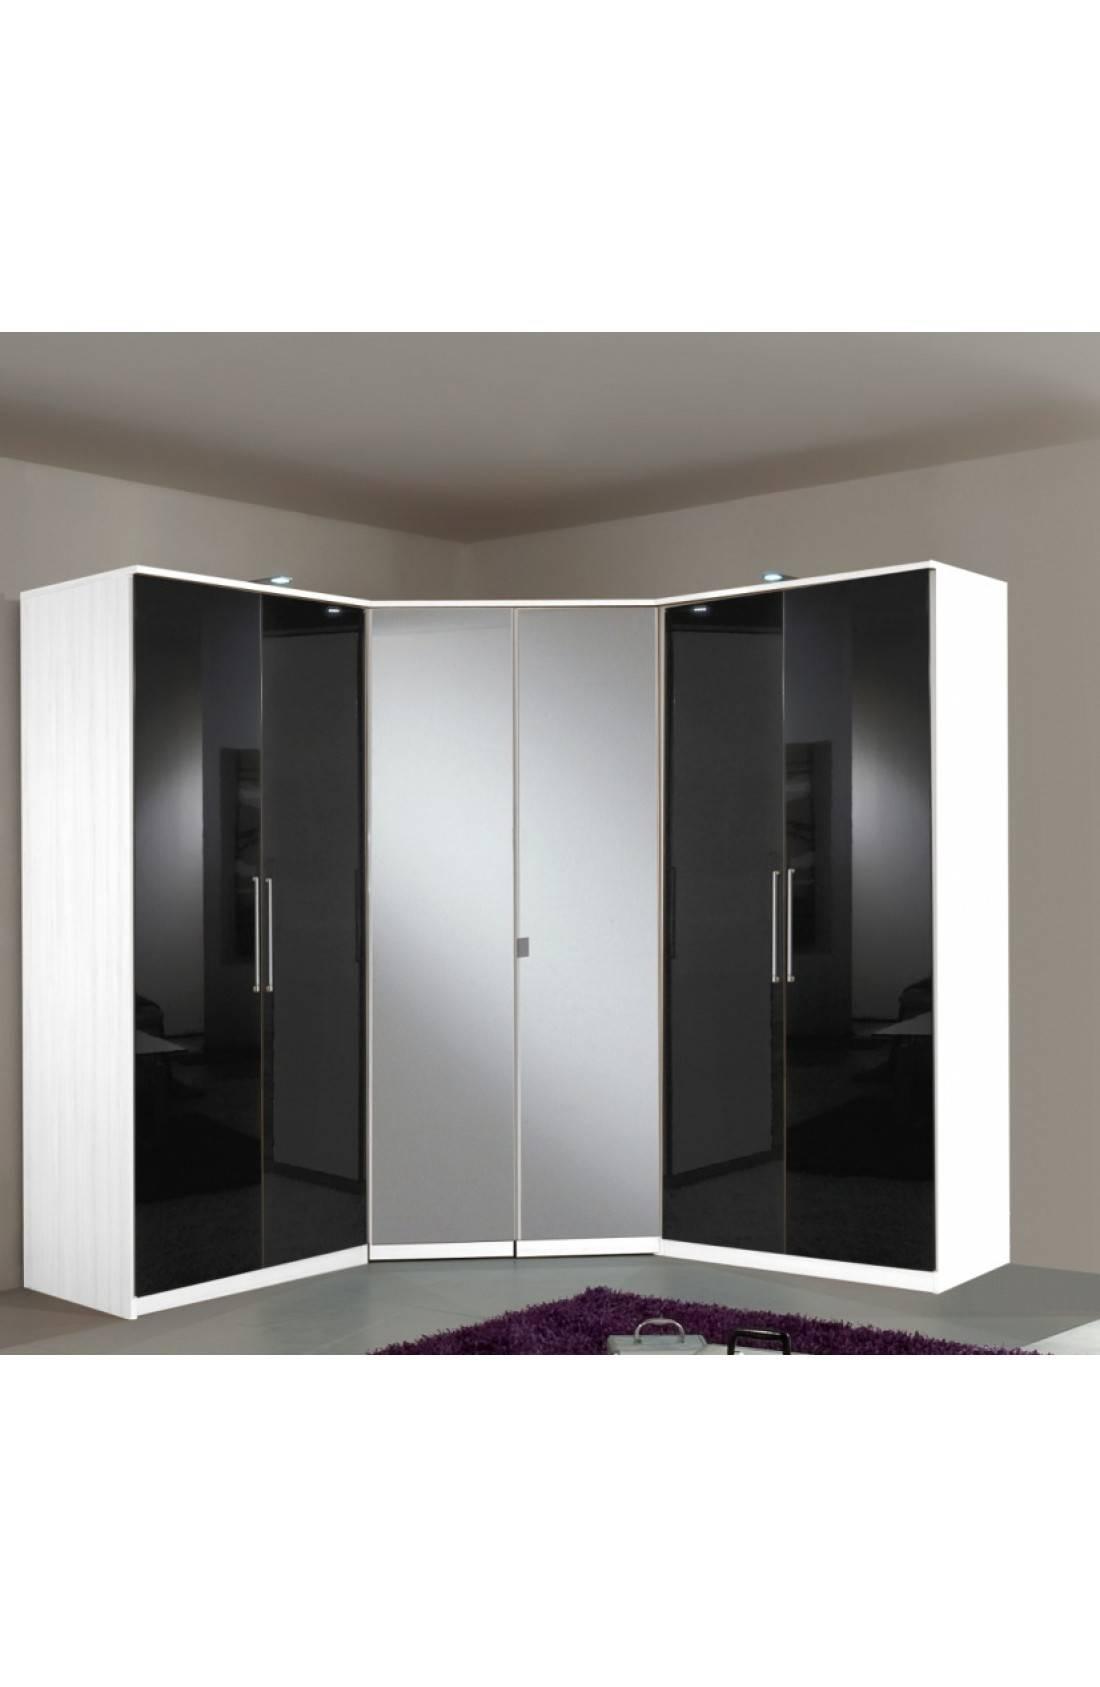 Slumberhaus 'gamma' 6 Door Corner Wardrobe Fitment With White with regard to Black Gloss Wardrobes (Image 15 of 15)